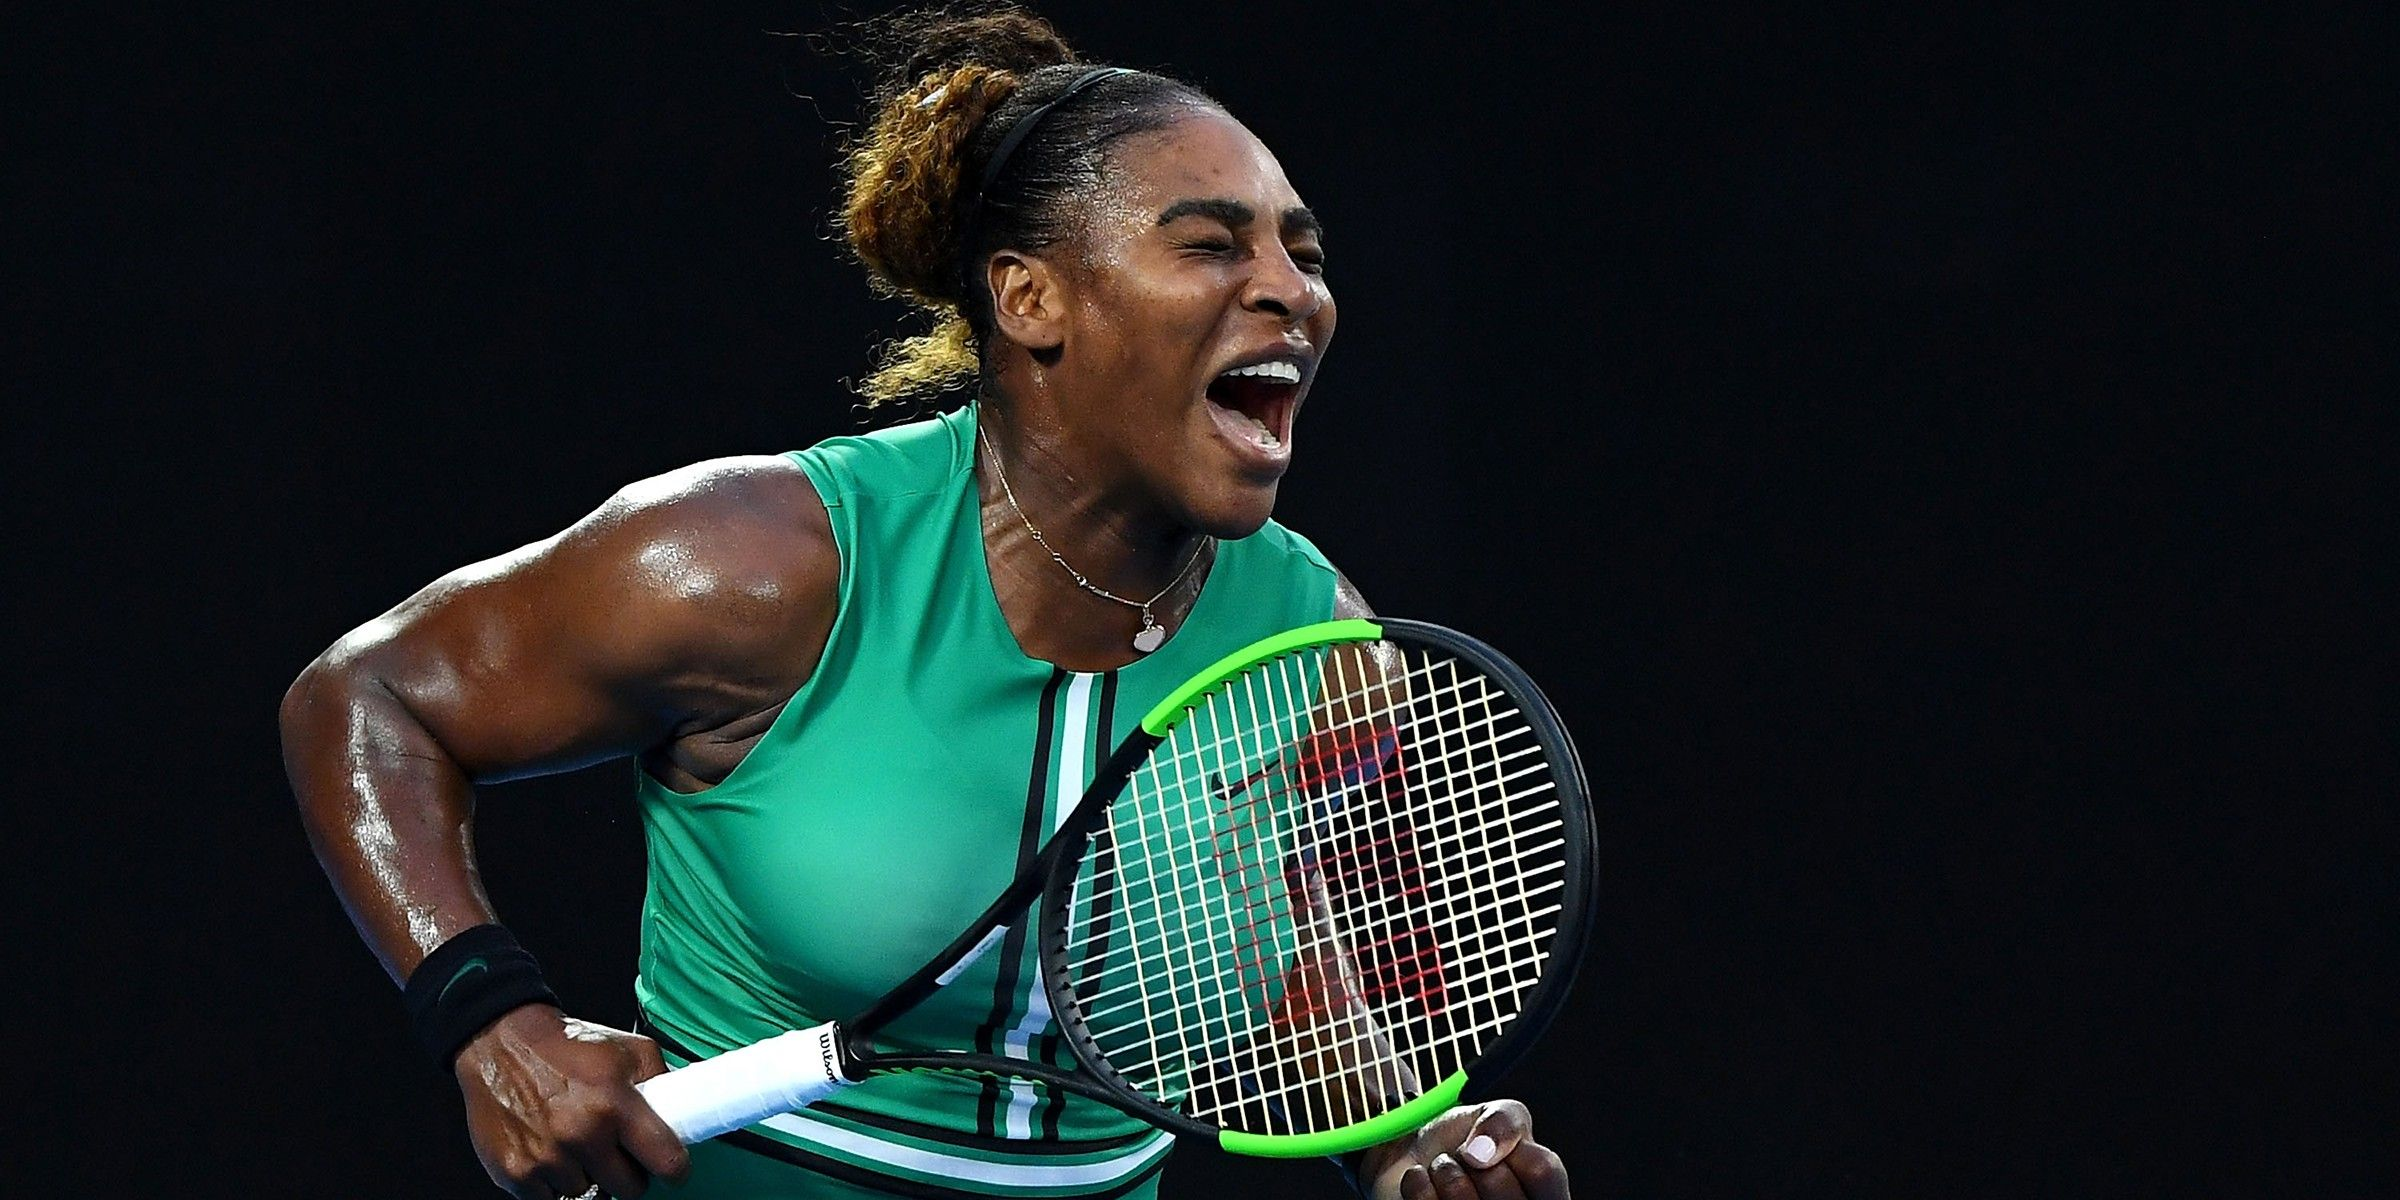 New Hot Serena Williams Wallpaper Di 2020